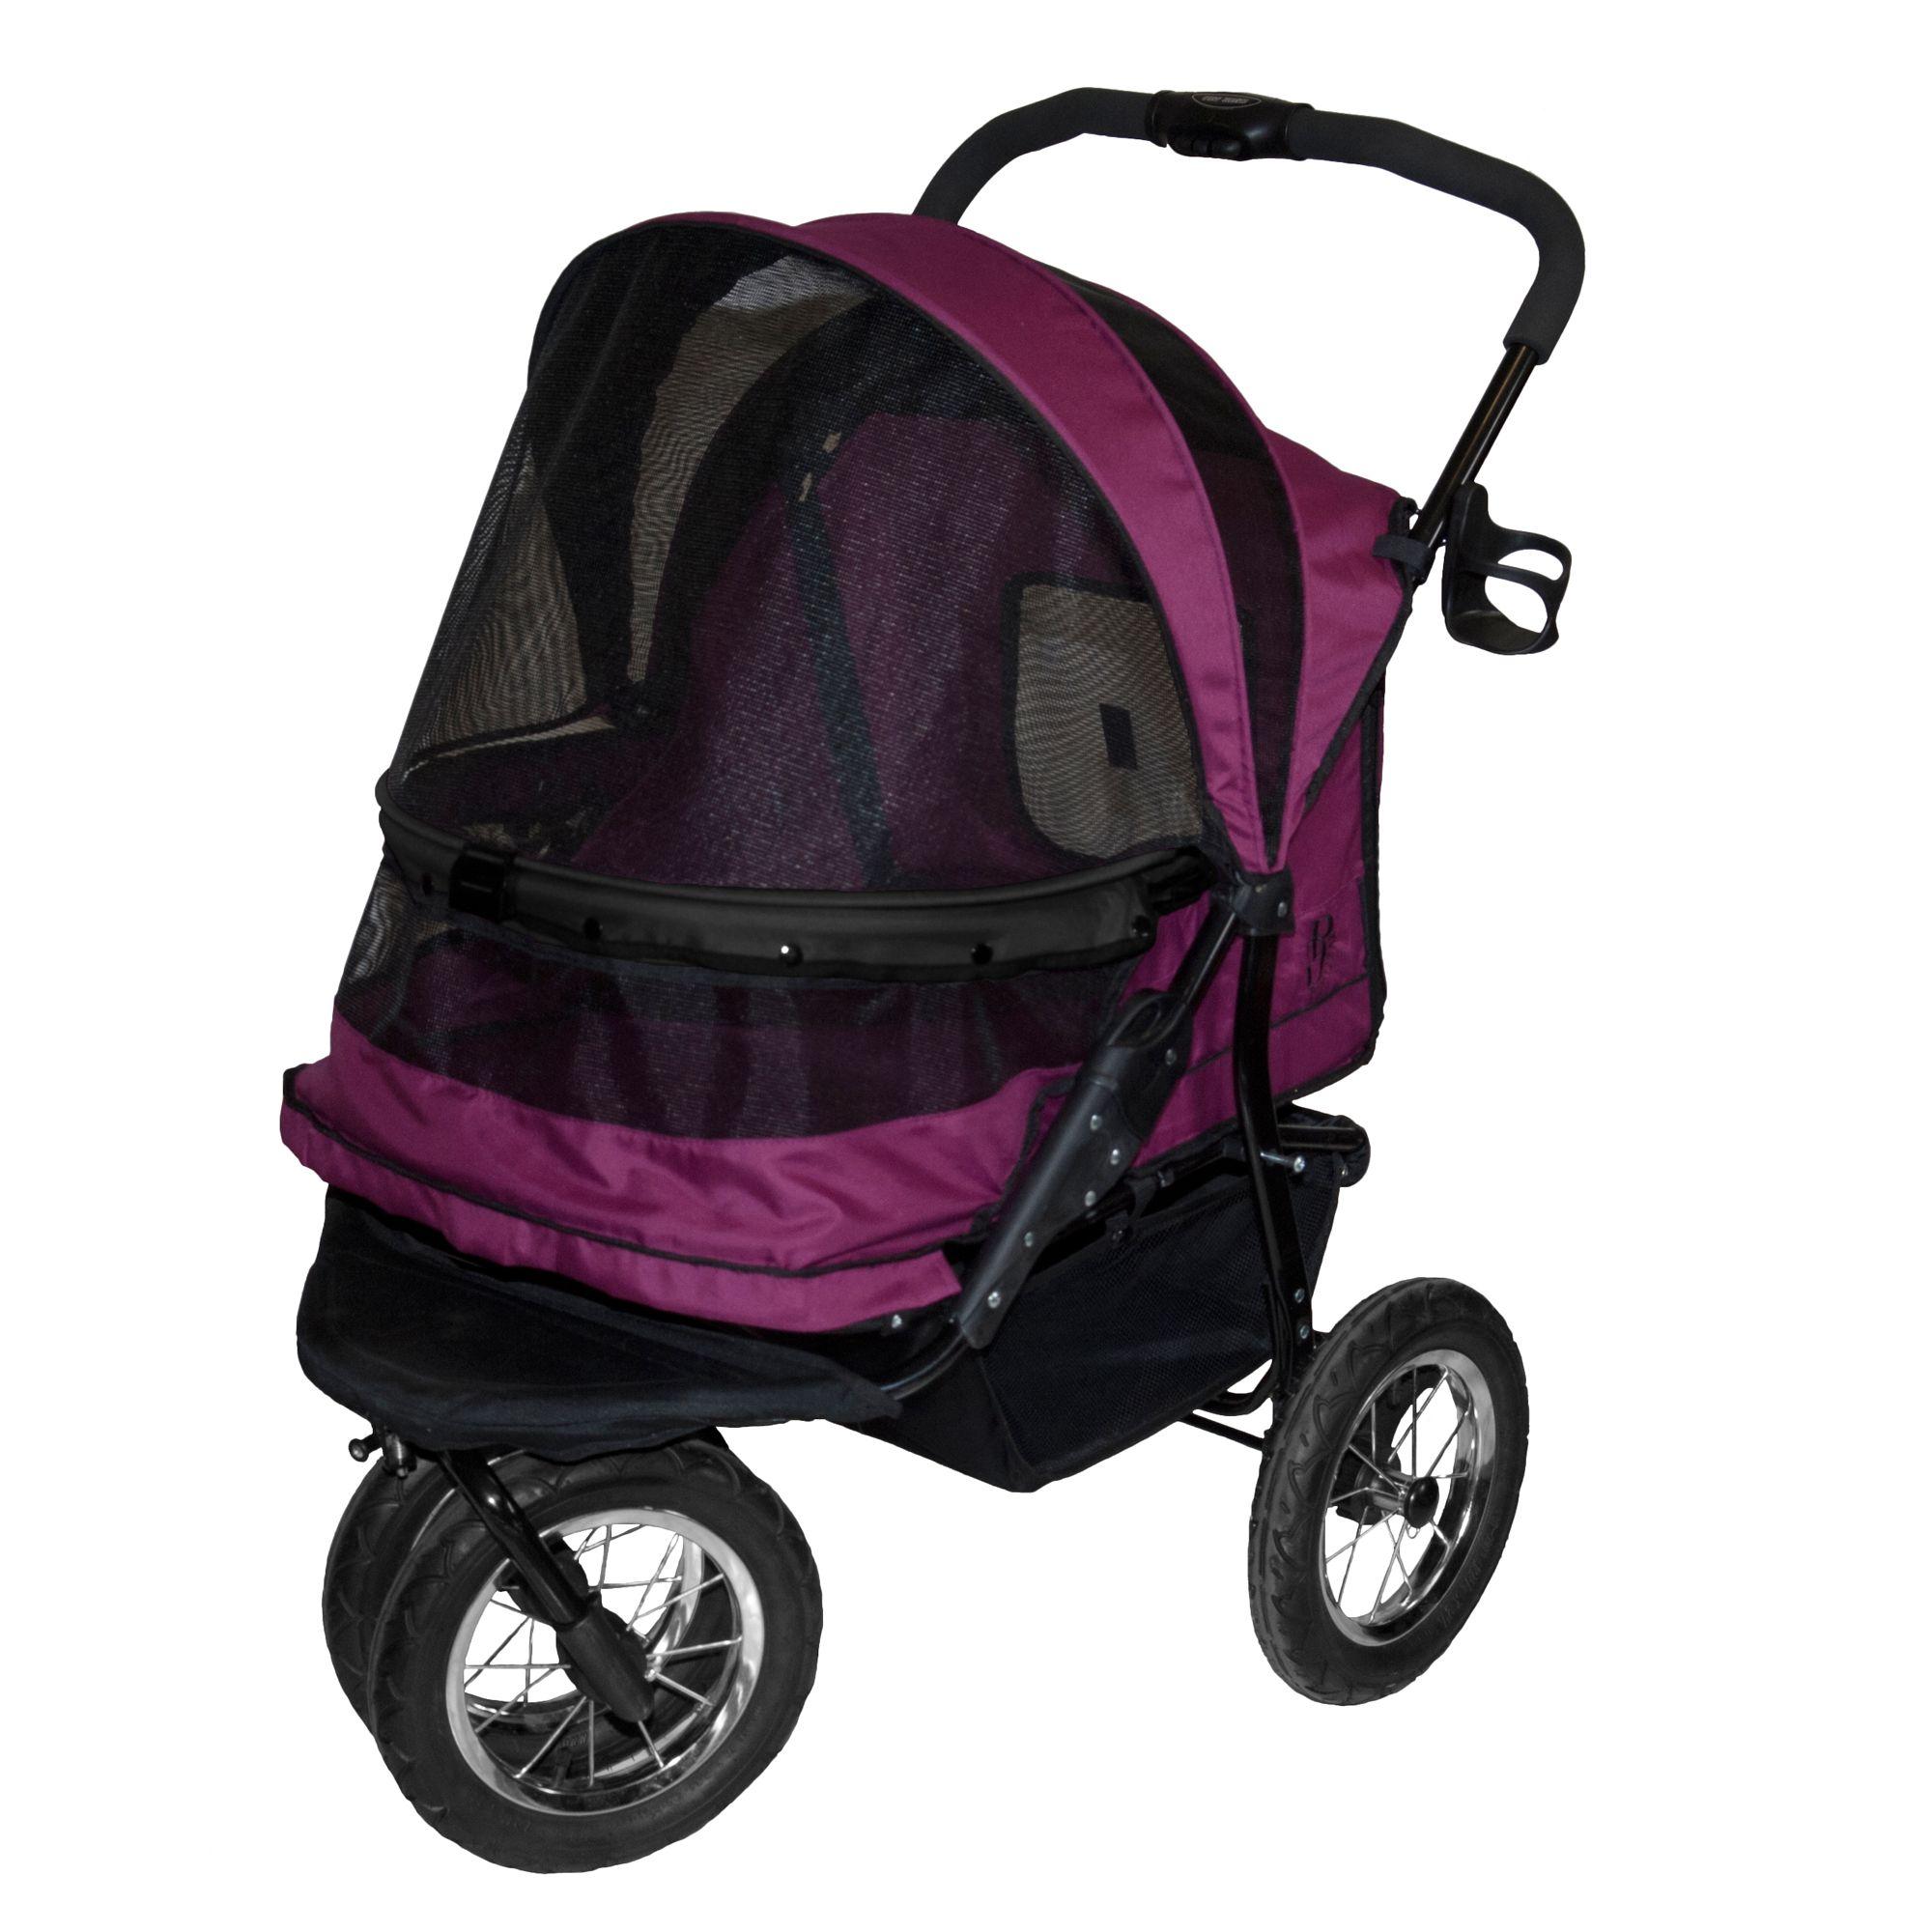 "Pet Gear NO-ZIP Double Pet Stroller size: 27""L x 20""W x 23""H, Purple 5249103"